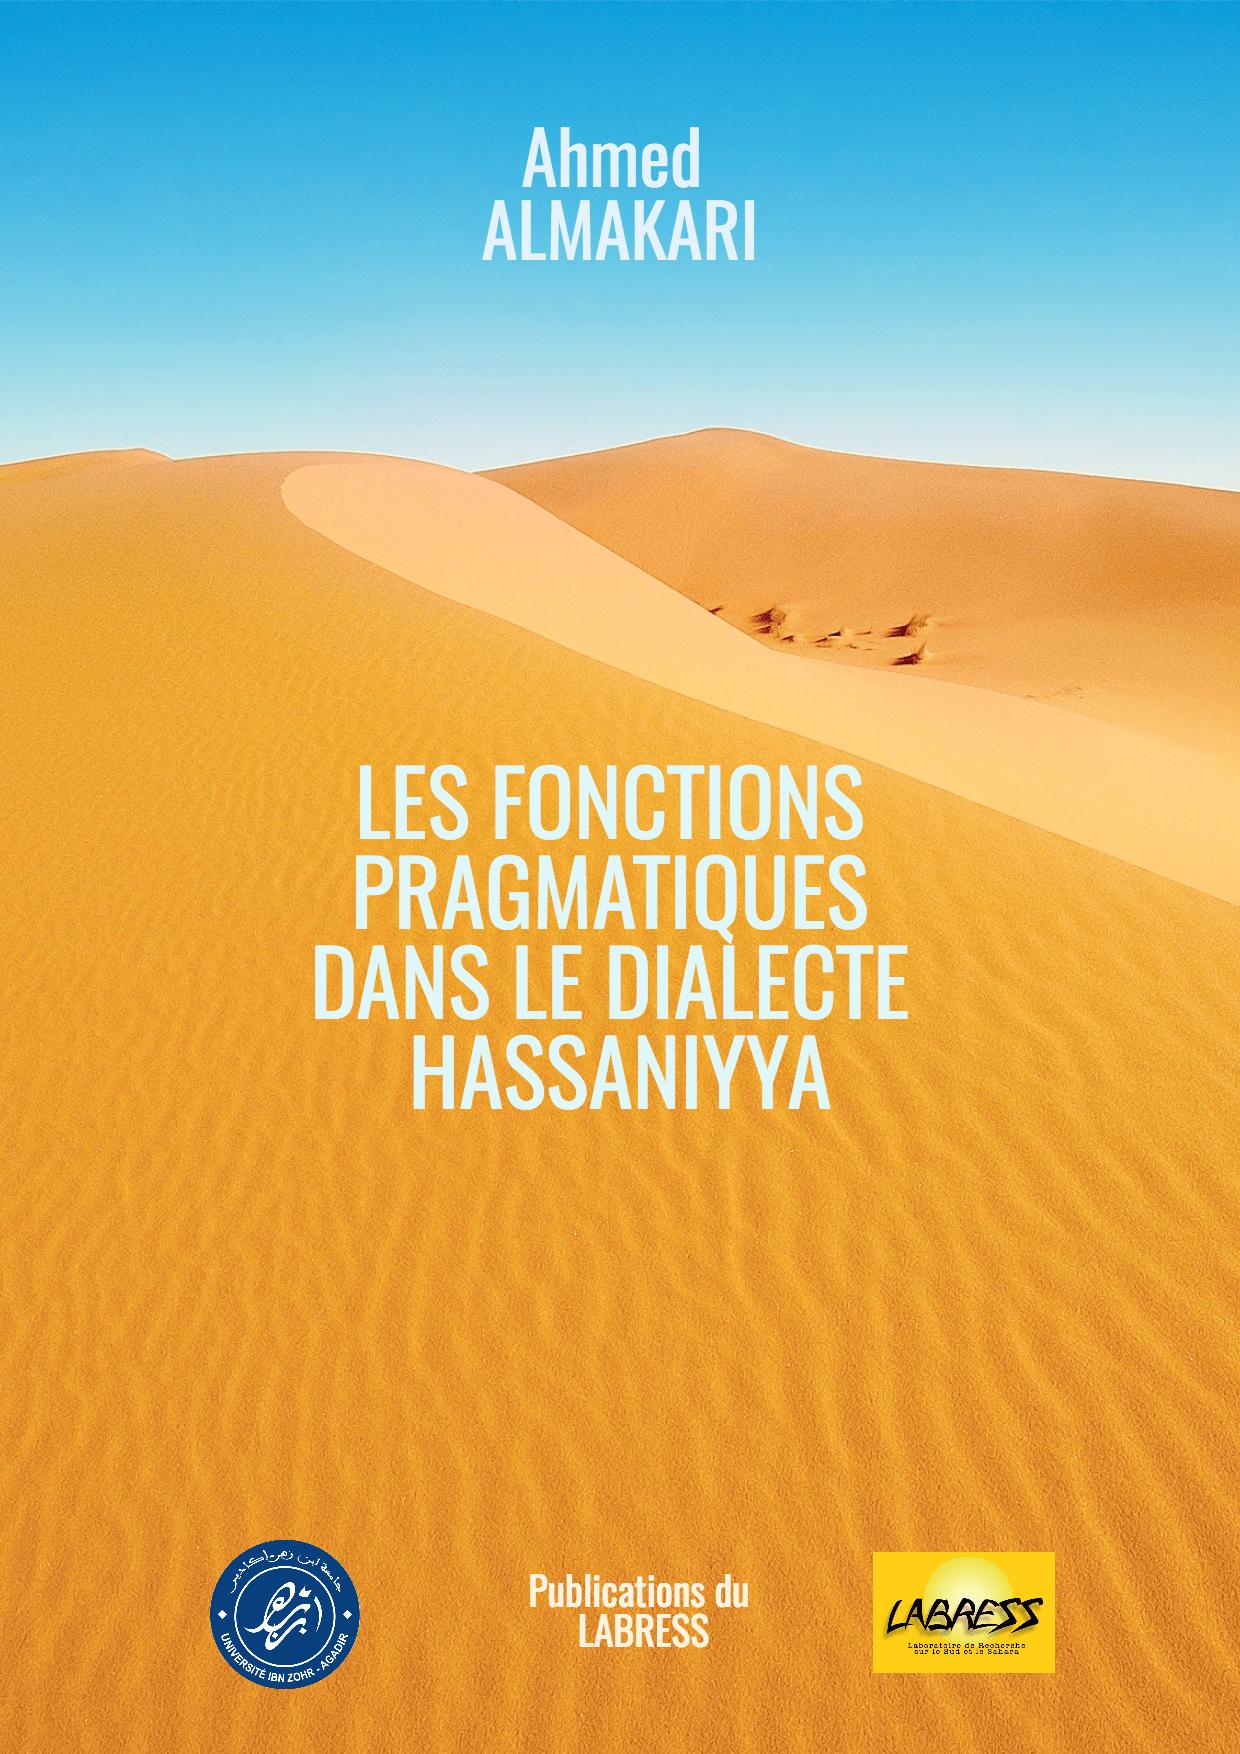 Desert,                Erg,                Sahara,                Text,                Aeolian,                Landform,                Singing,                Sand,                Landscape,                Dune,                Line,                White,                Yellow,                 Free Image